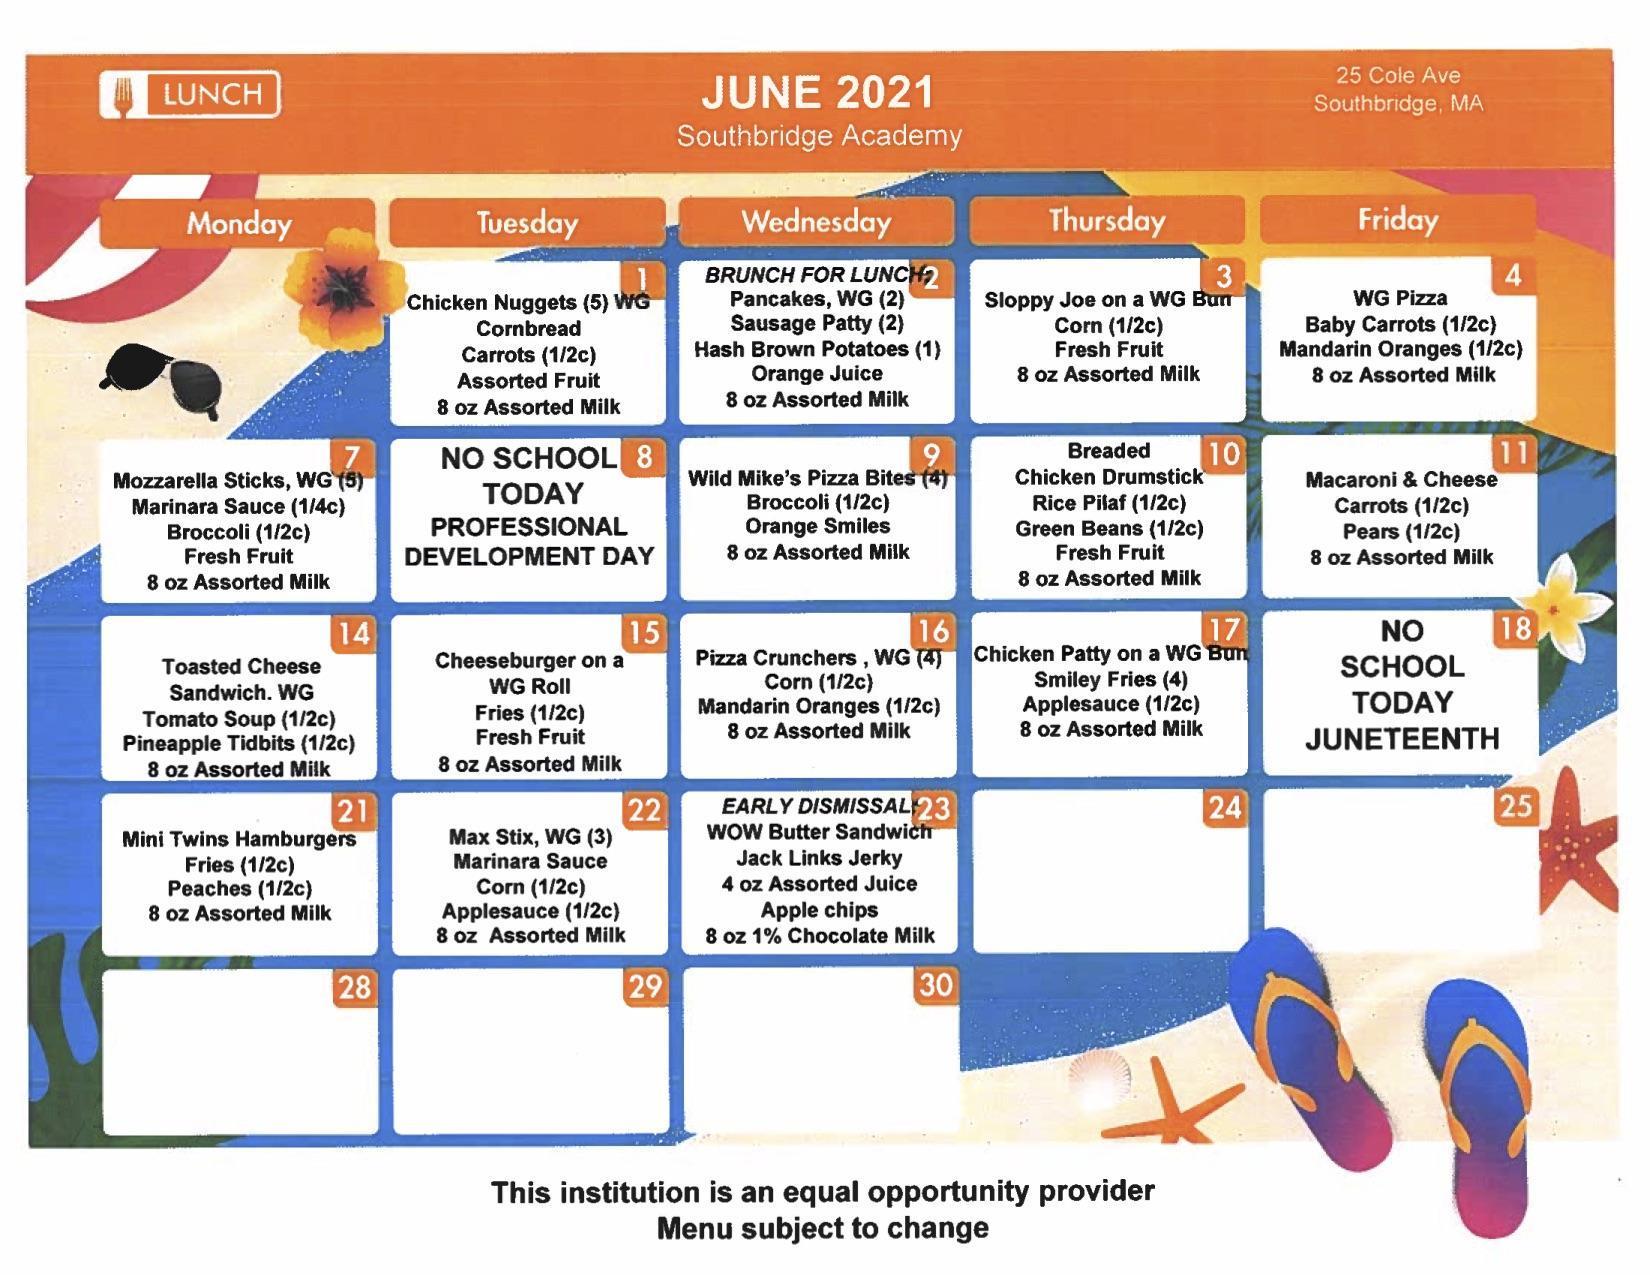 Southbridge Academy menus for June 2021